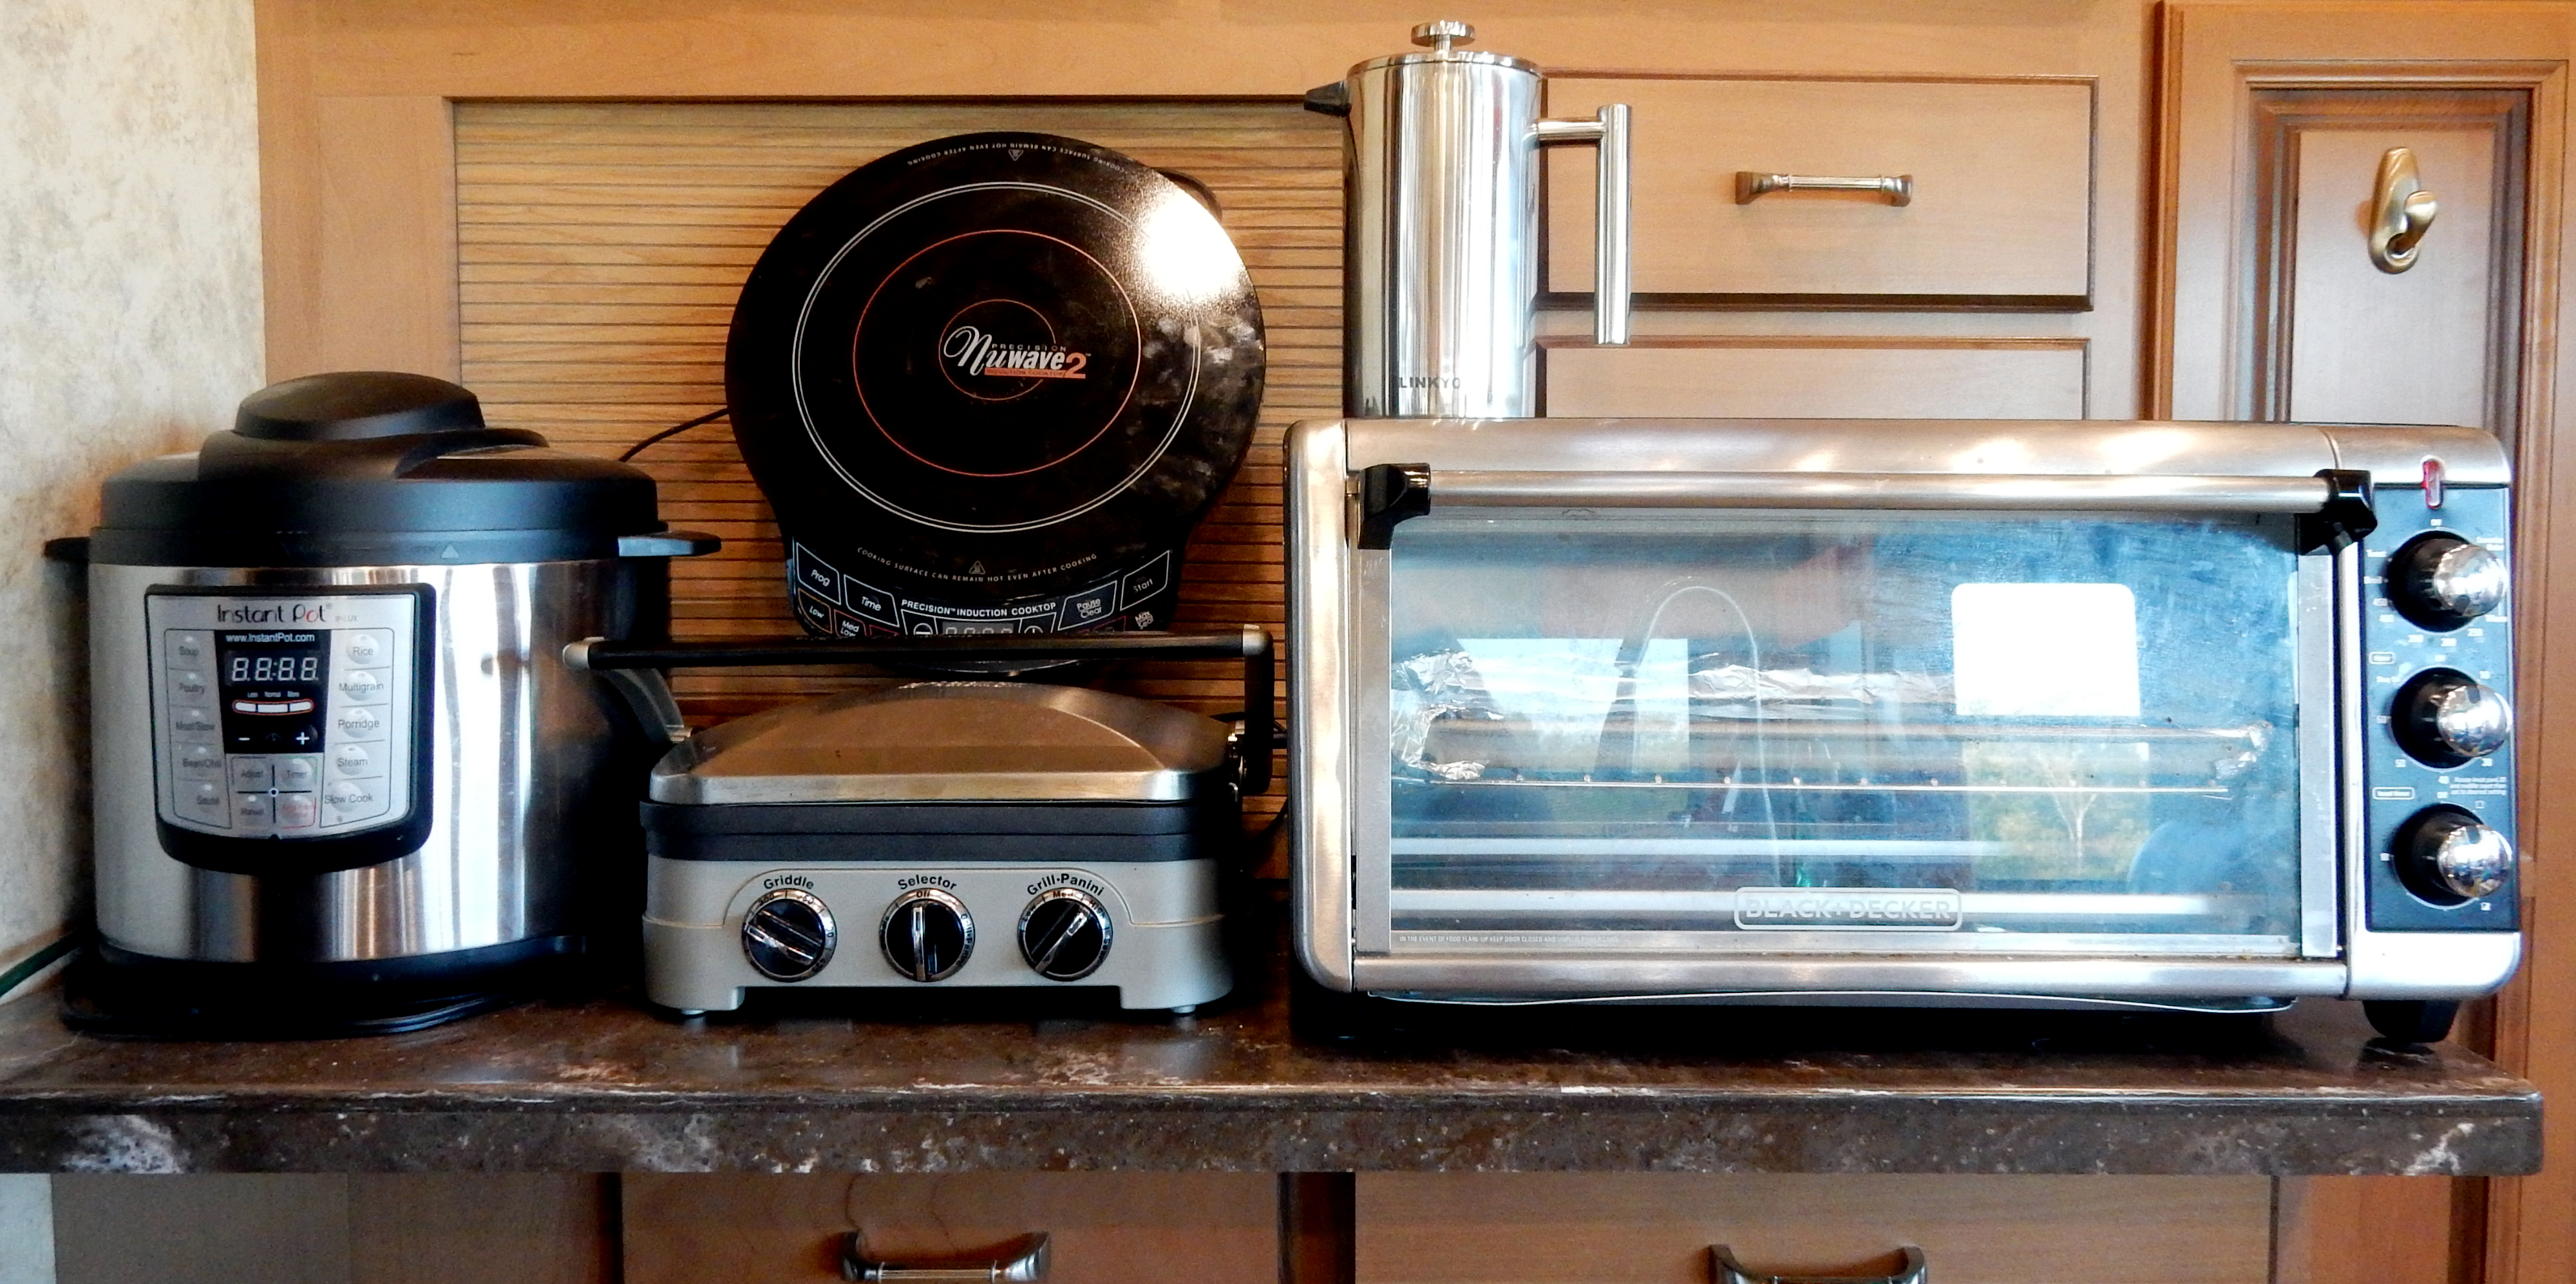 Tag: Rv Kitchen Appliances